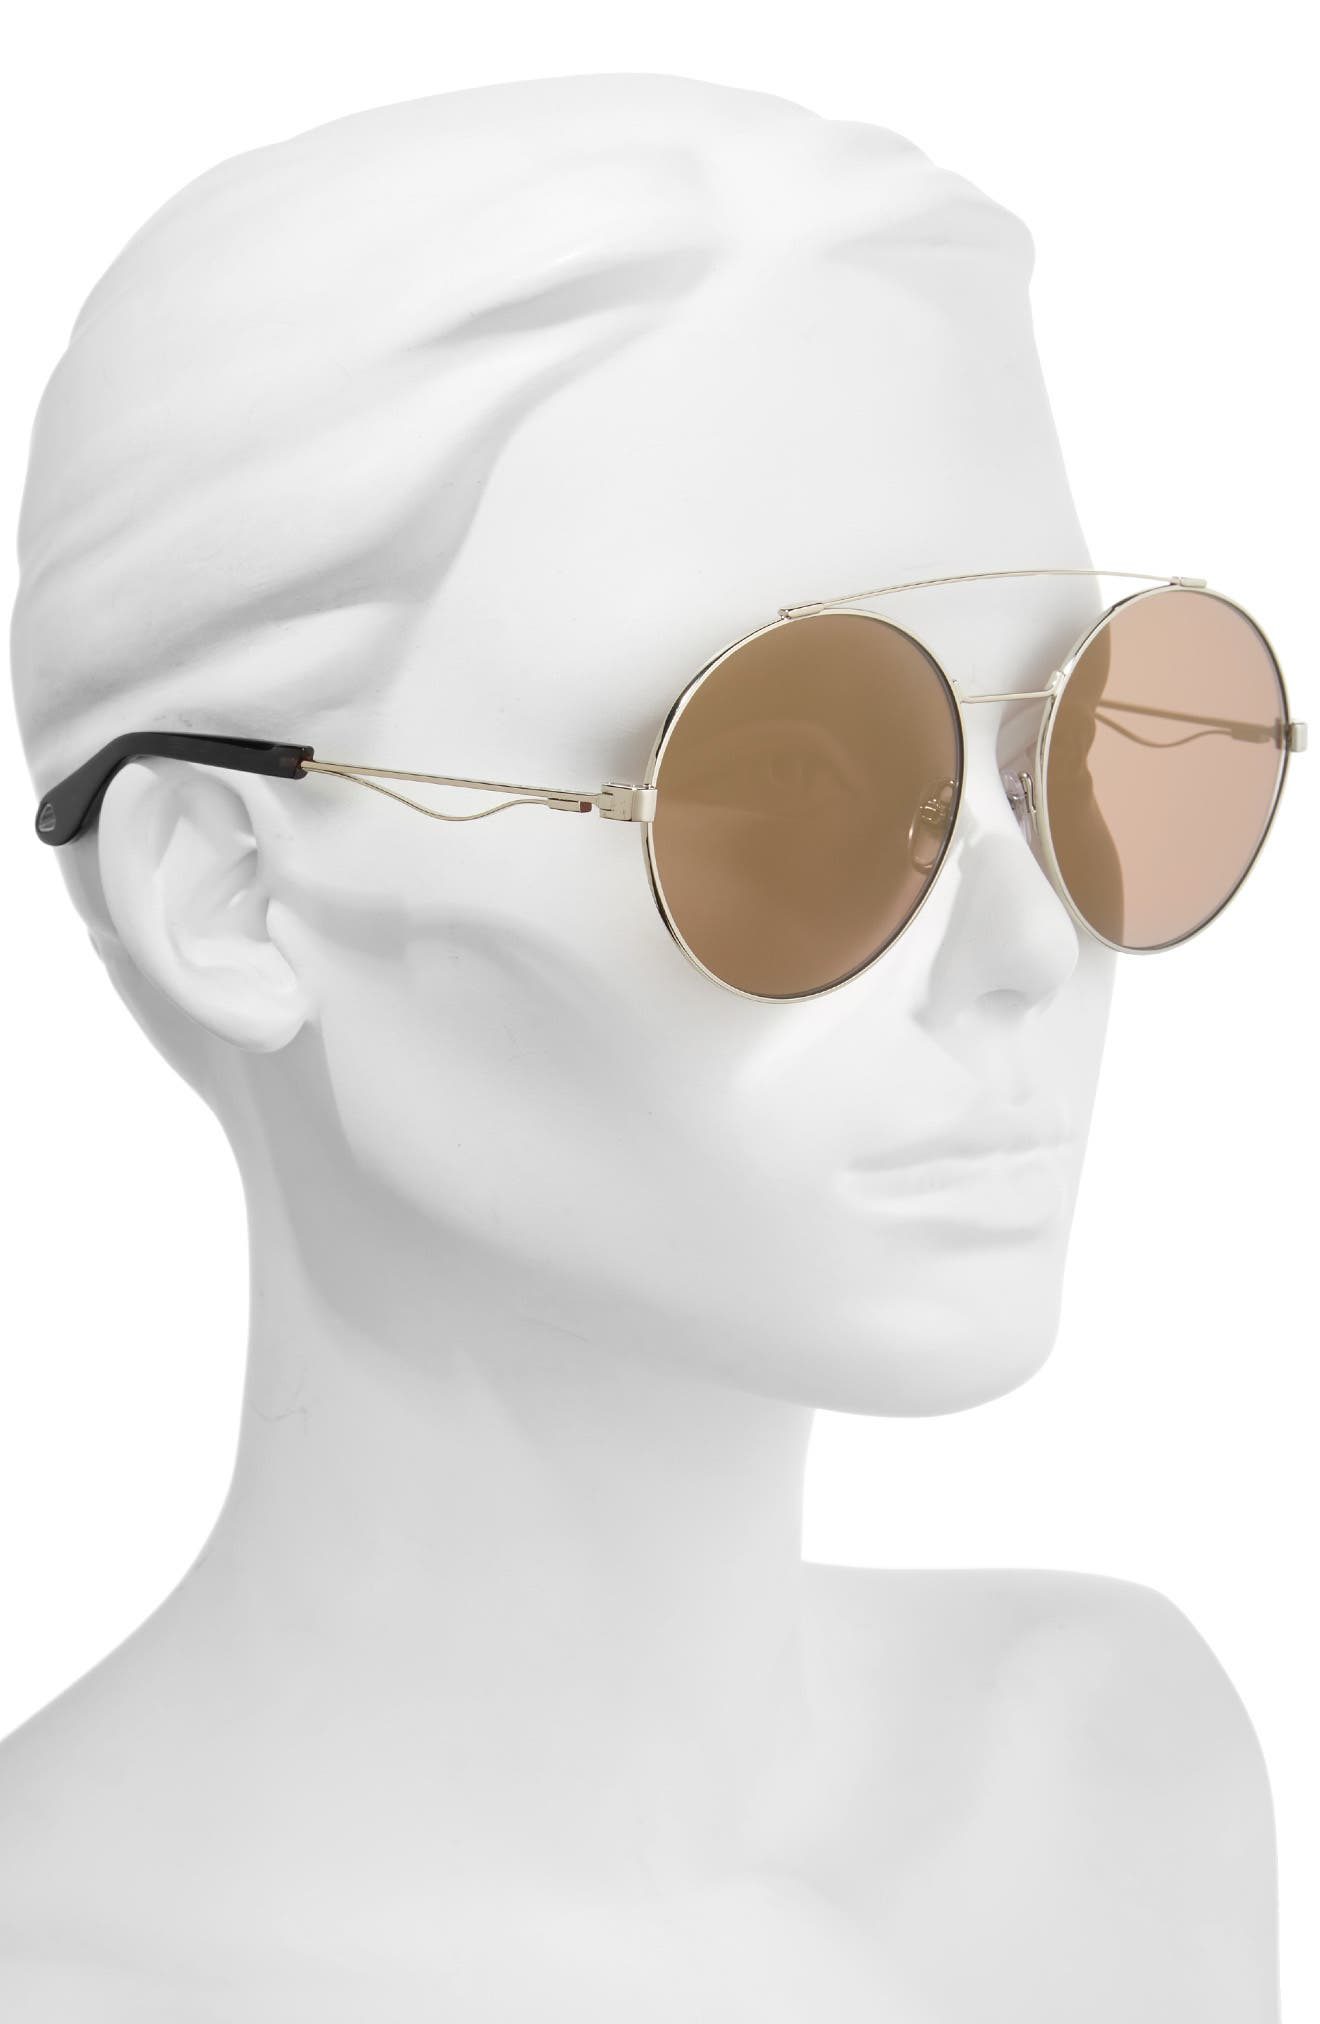 62mm Oversize Round Sunglasses,                             Alternate thumbnail 2, color,                             LIGHT GOLD